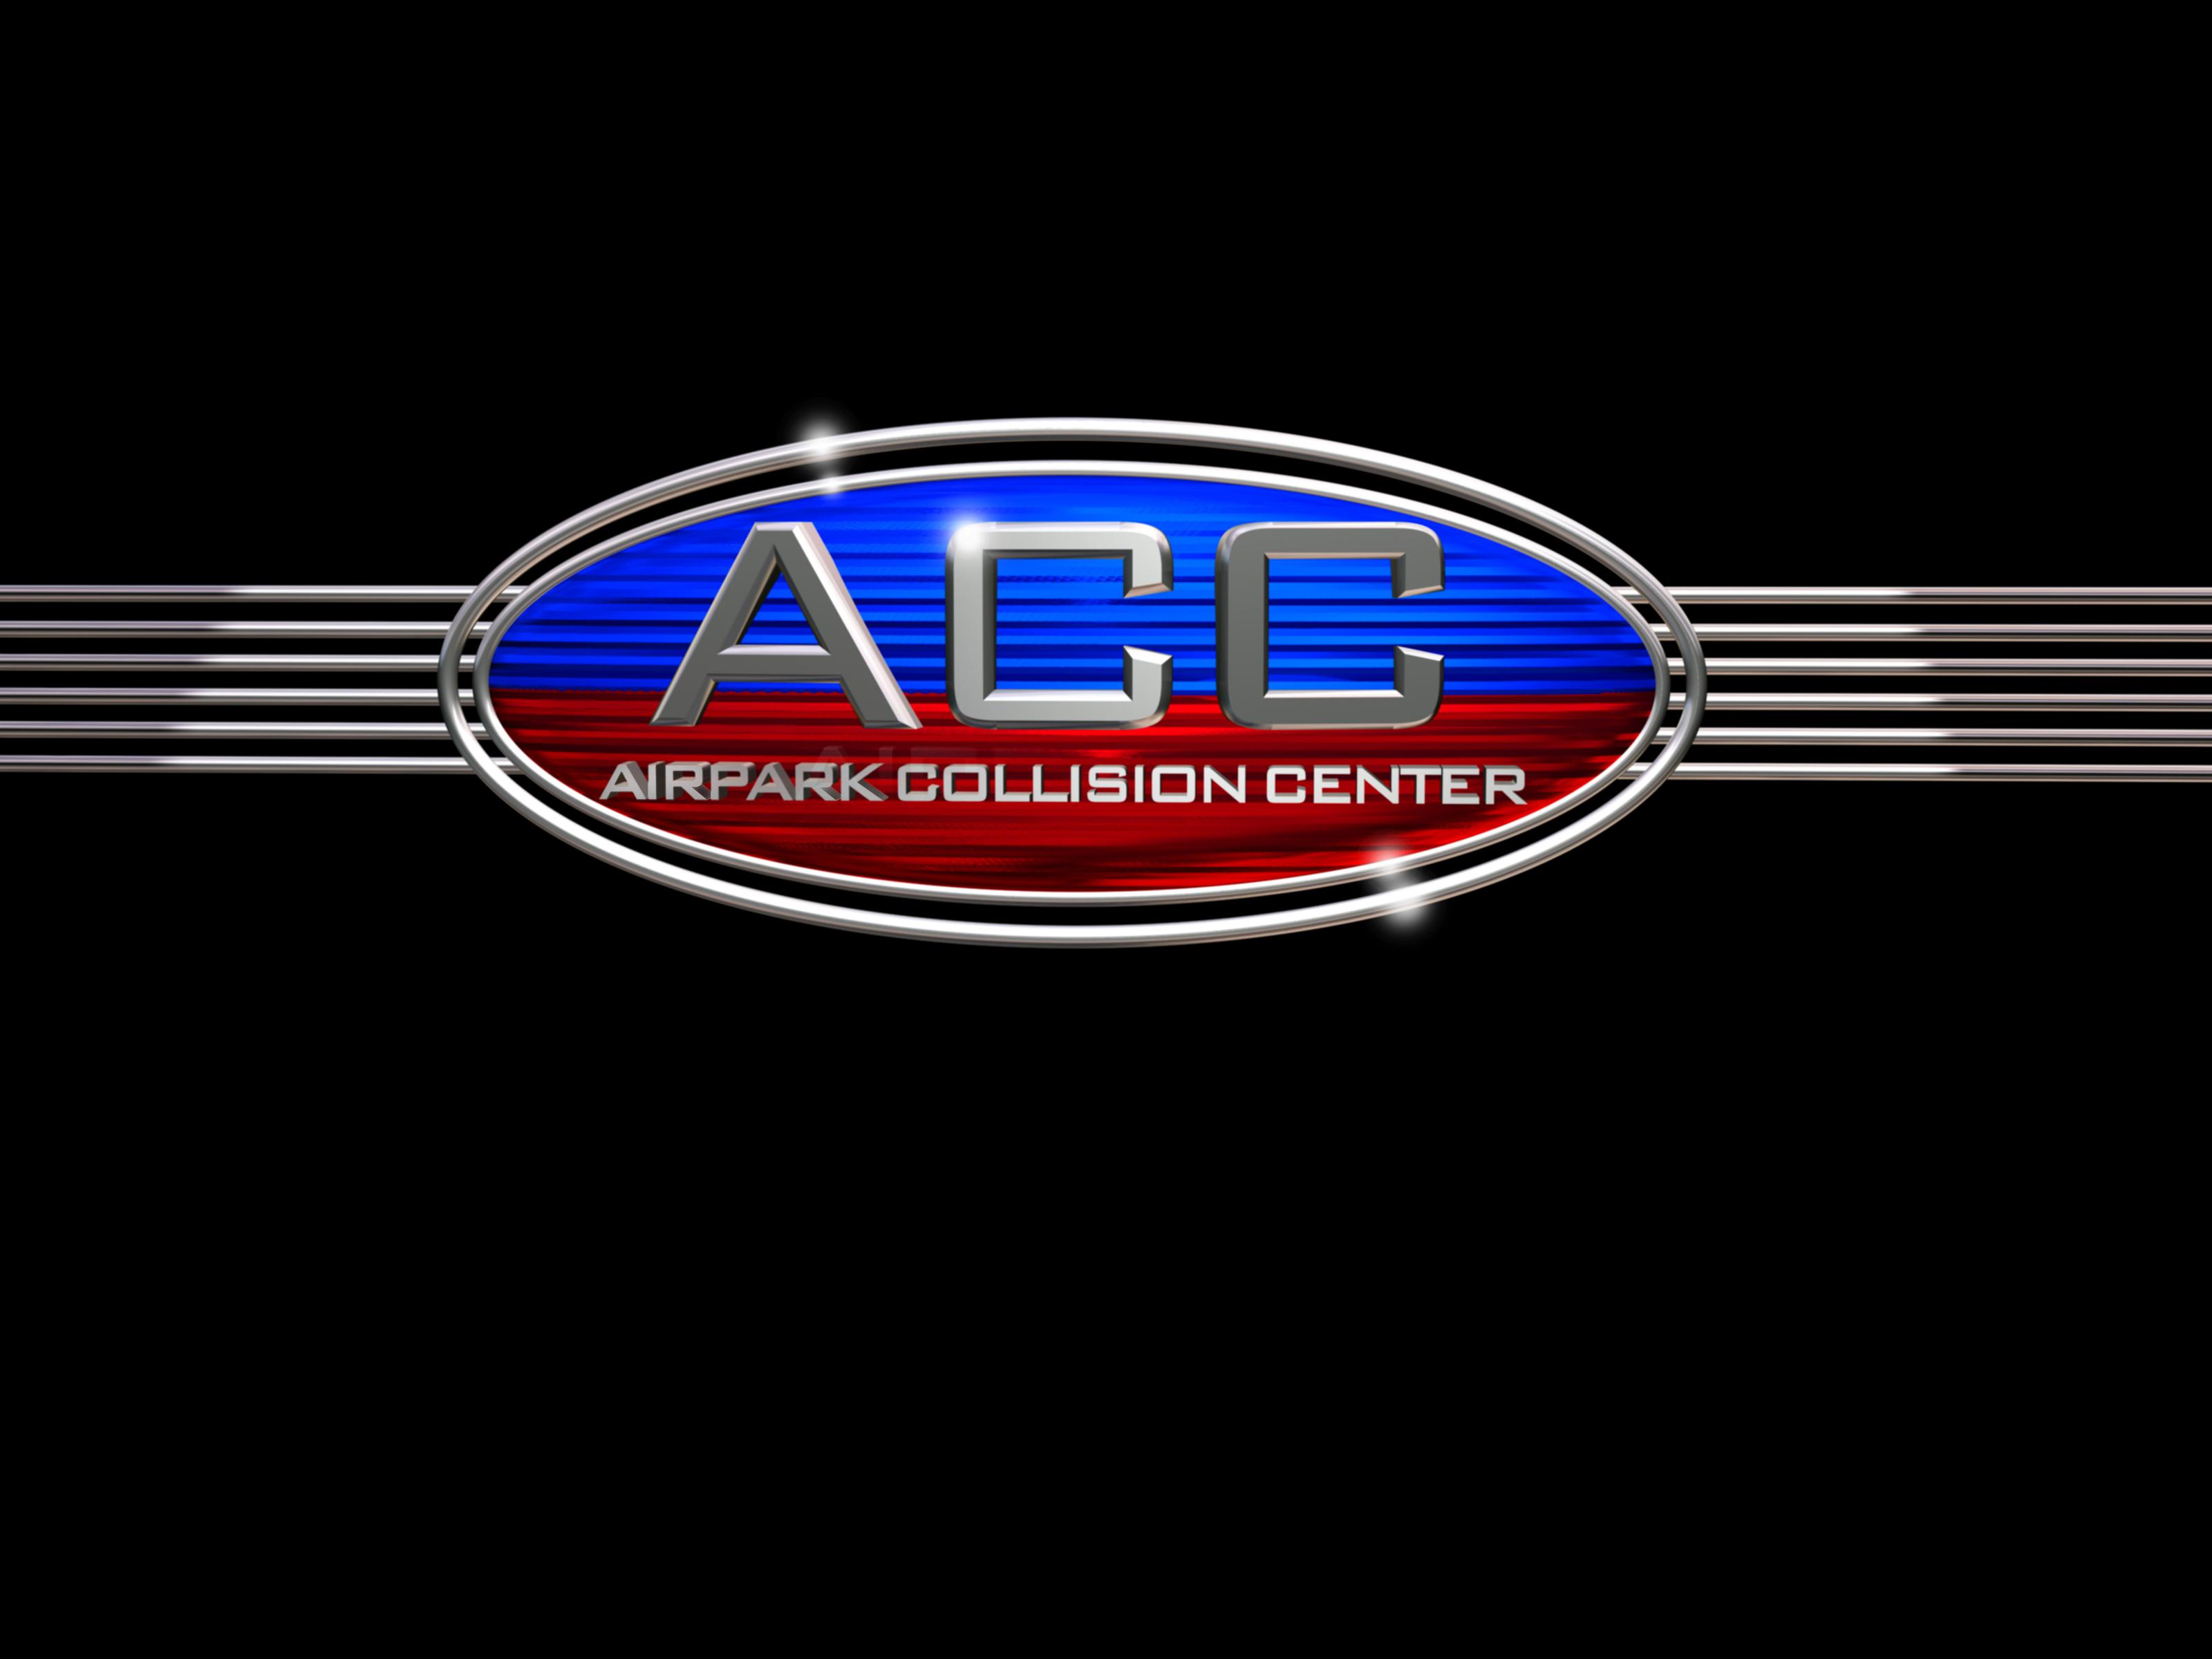 Airpark Collision Center